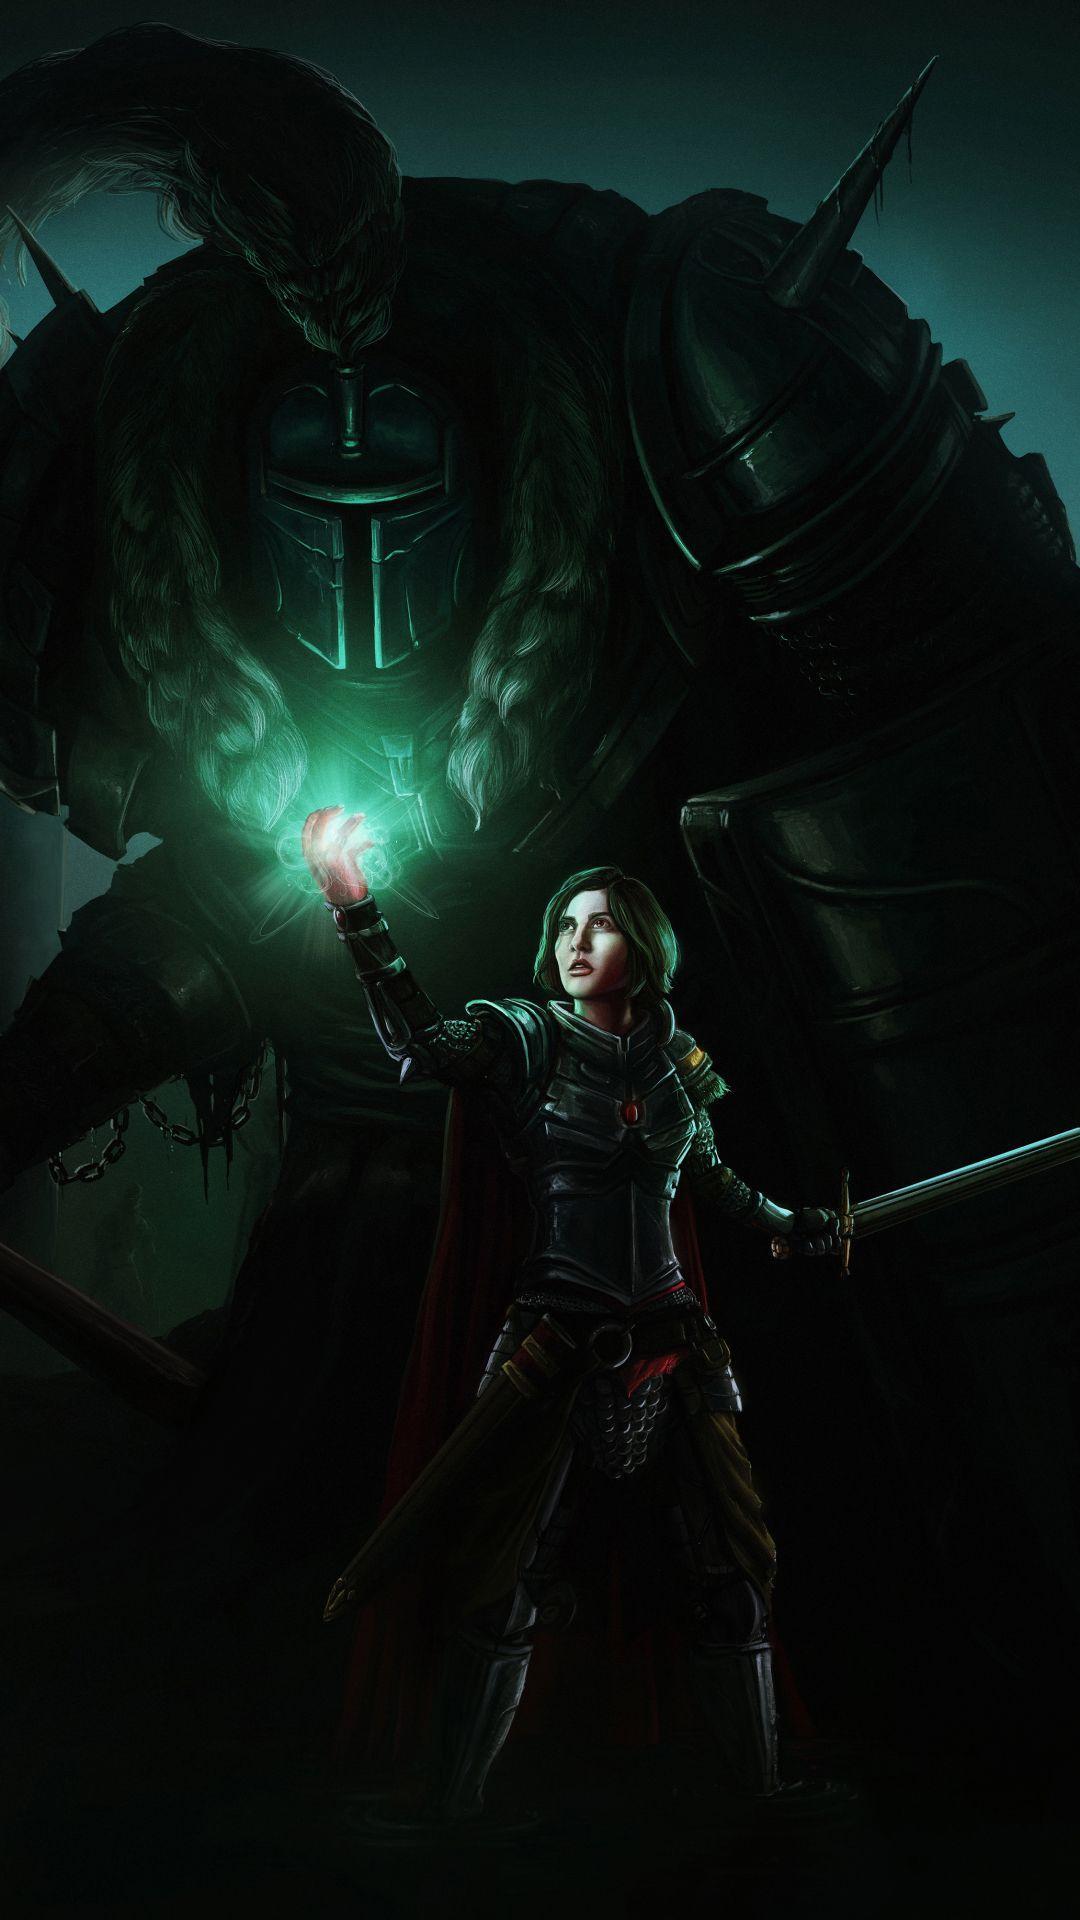 Dark Souls iPhone 5 Wallpapers - Top Free Dark Souls ...